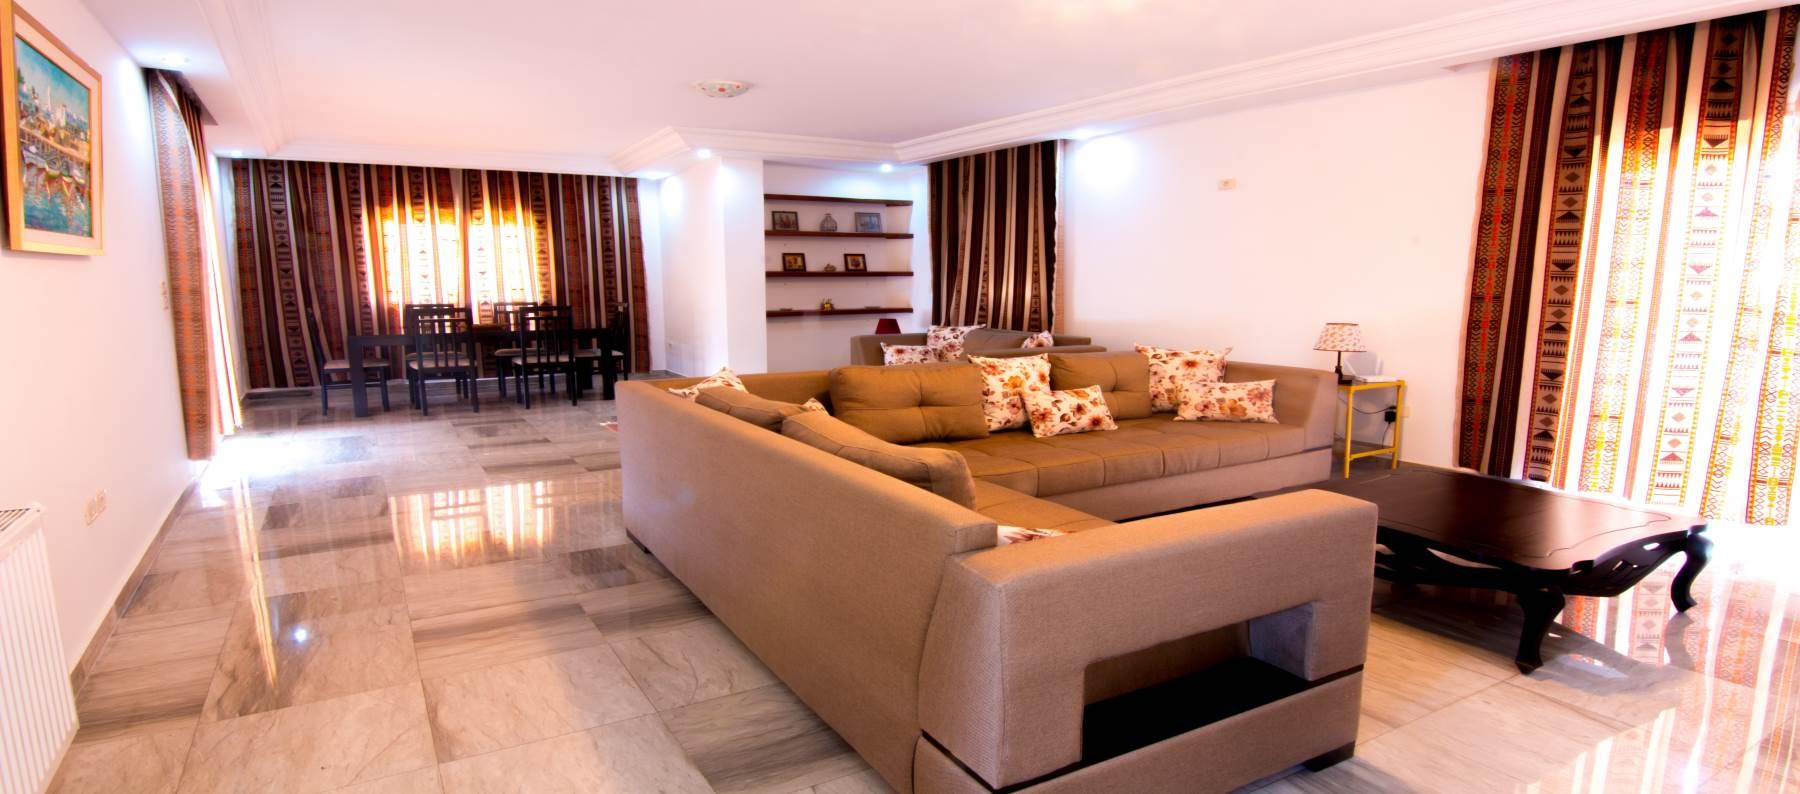 Splendide Appartement   Mahdia Place Apartments   Location Vacances à Mahdia